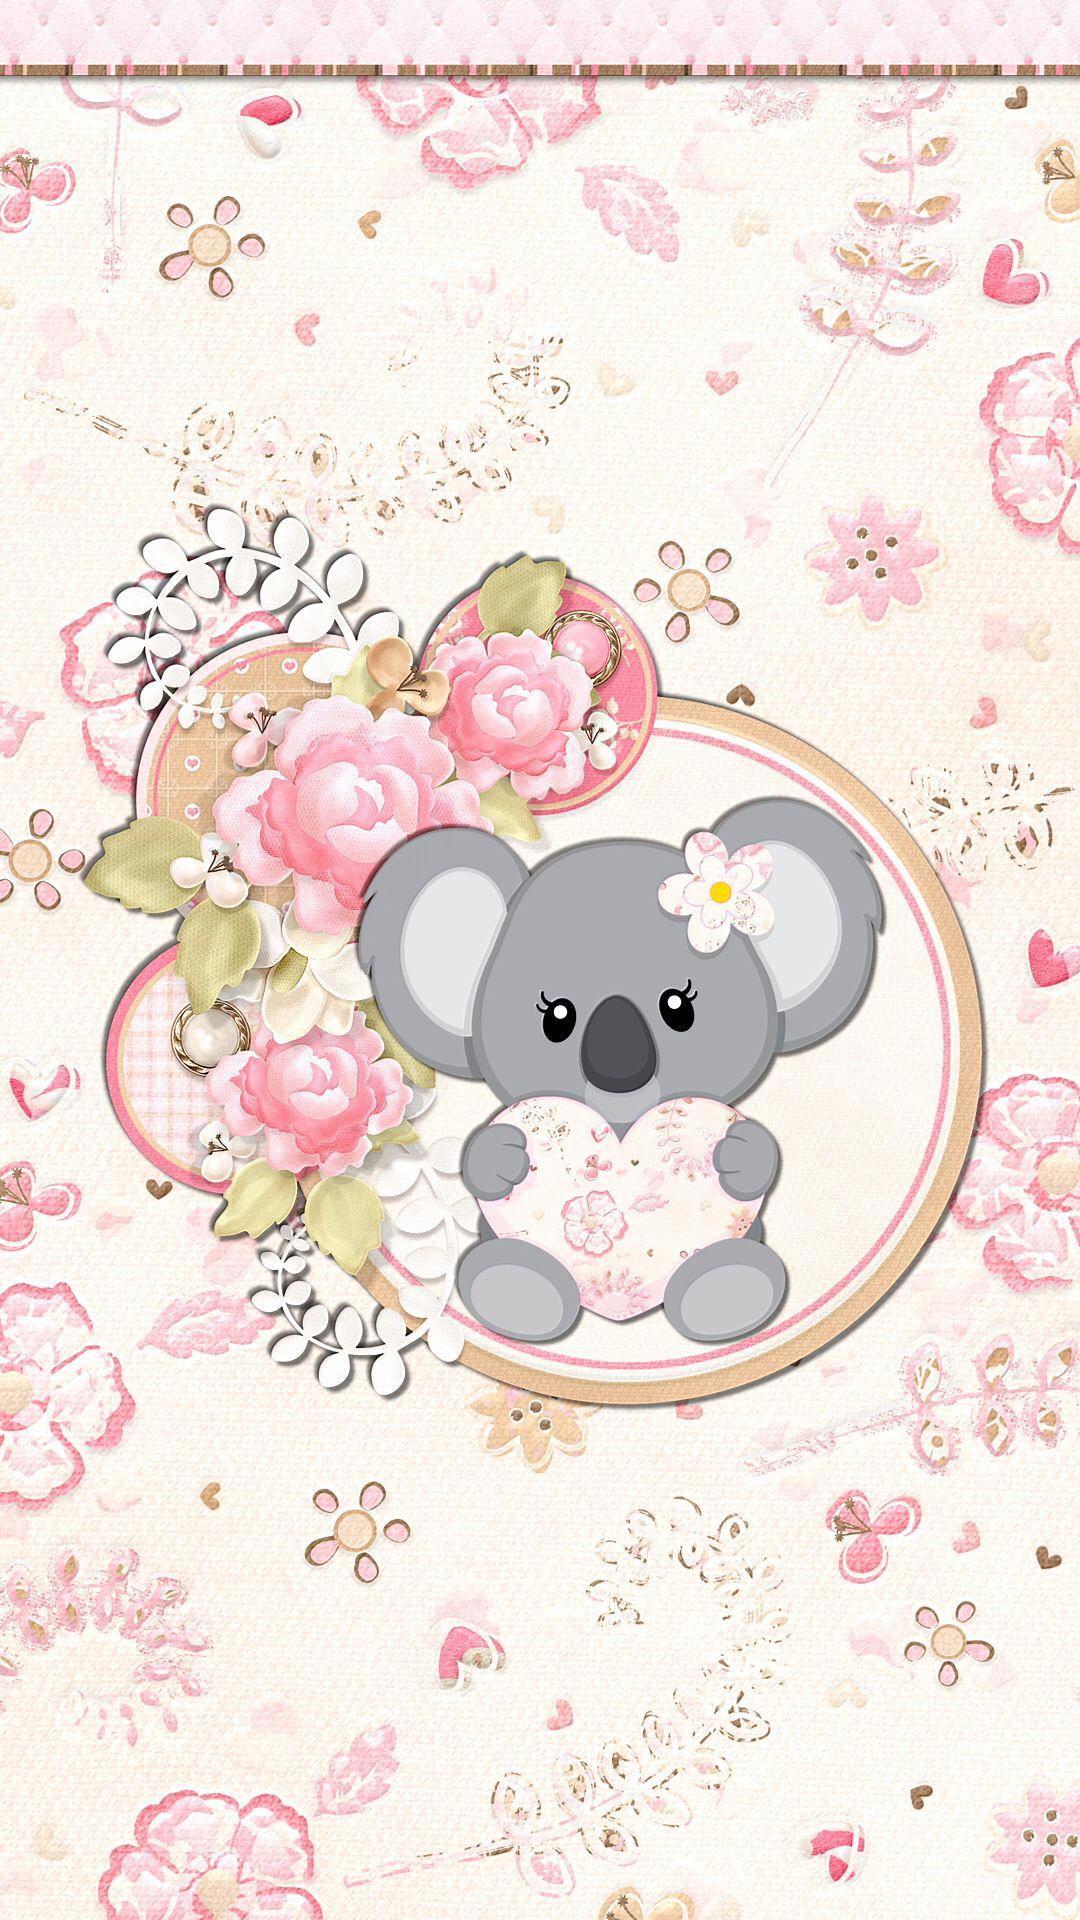 Koala Chic Wallpapers Reeseybelle Wallpaper Iphone Background Wallpaper Cute Wallpapers